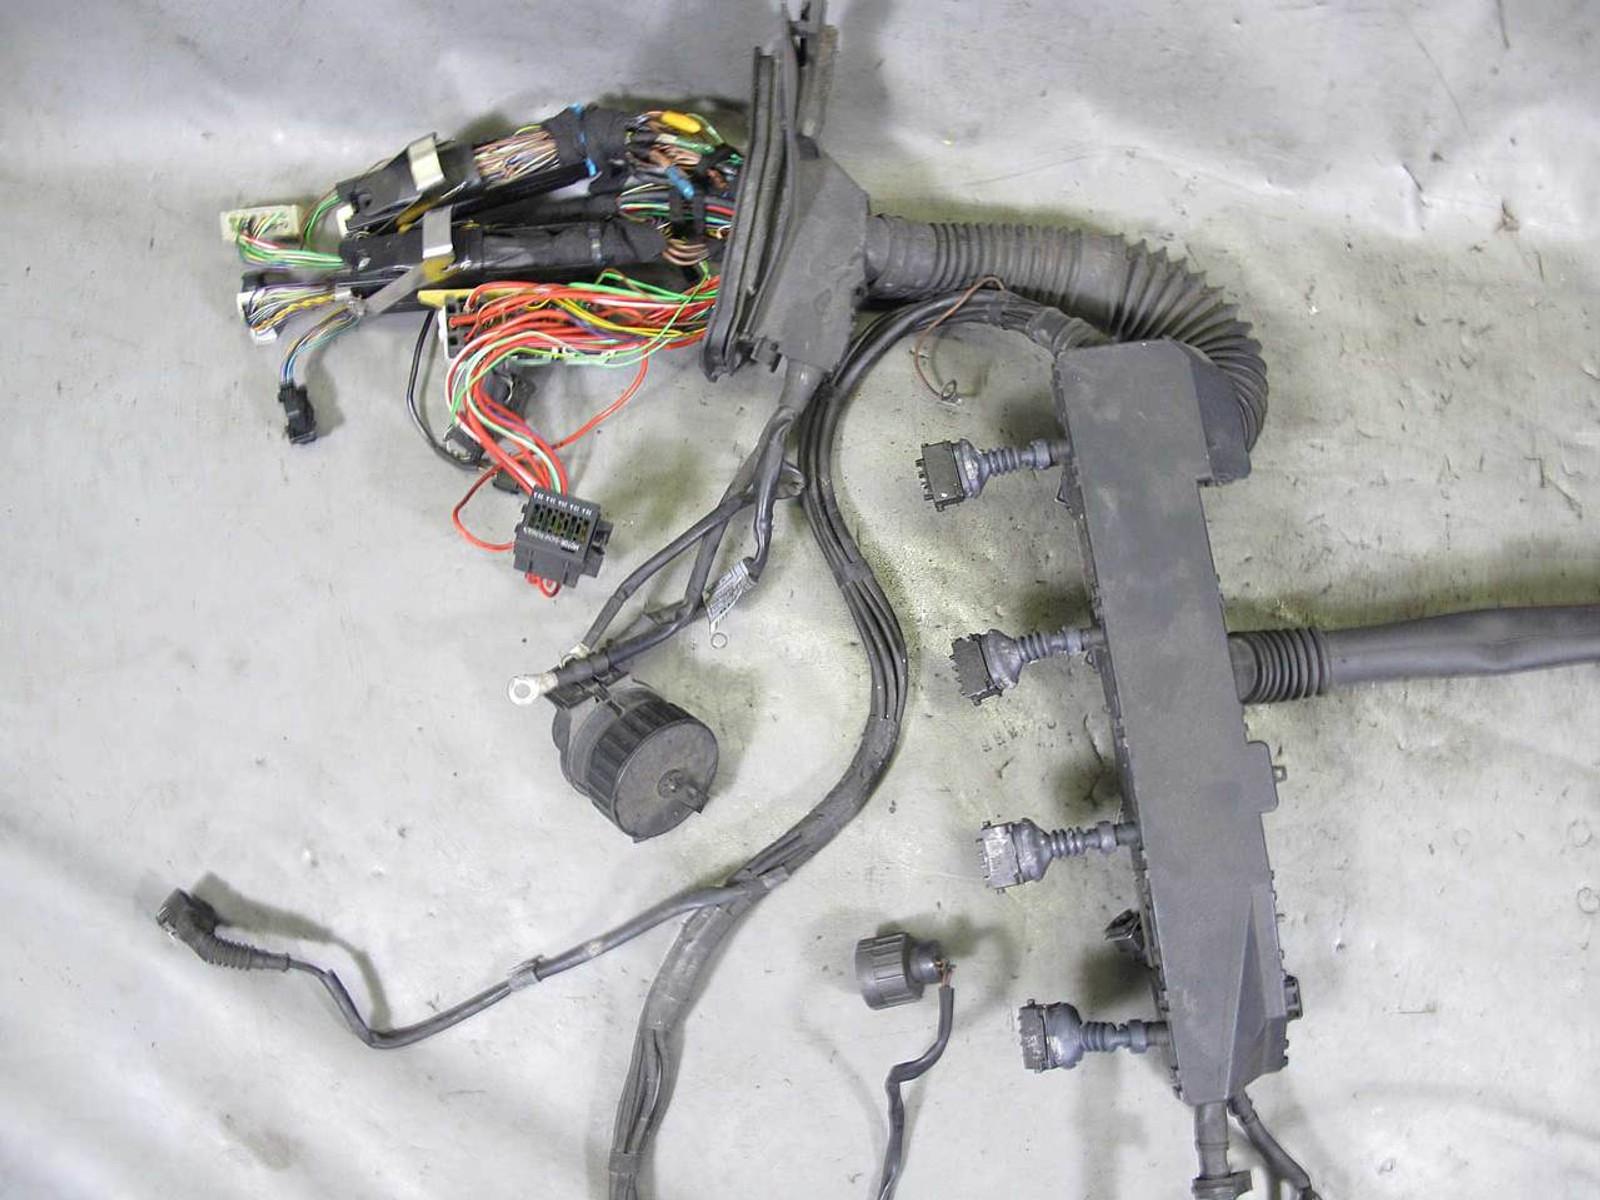 1996 1997 bmw e38 740i m62b44 v8 engine wiring harness complete used rh prussianmotors com Wiring Harness Connector Plugs Wiring Harness Terminals and Connectors